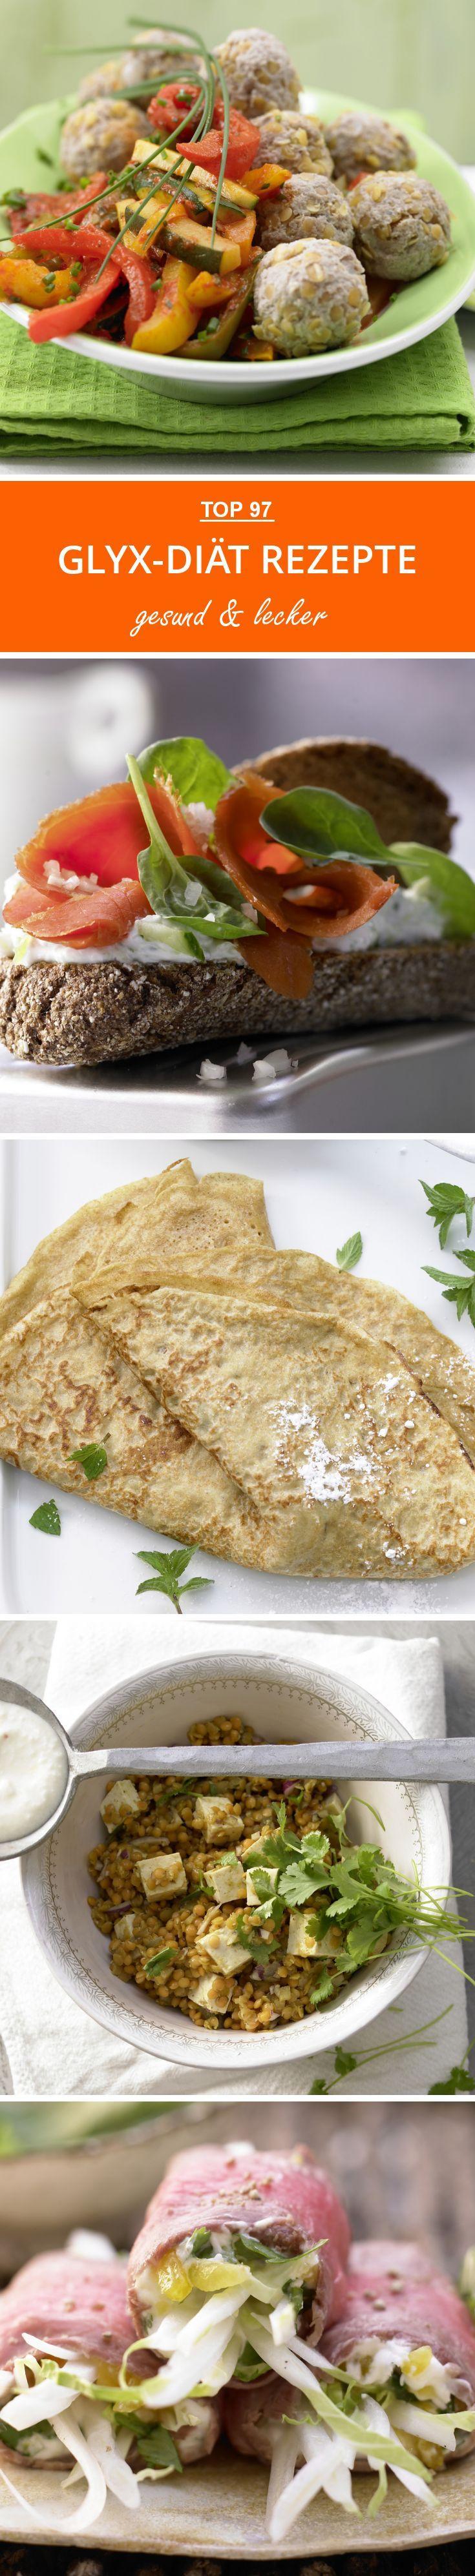 Glyx-Diät Rezepte | eatsmarter.de